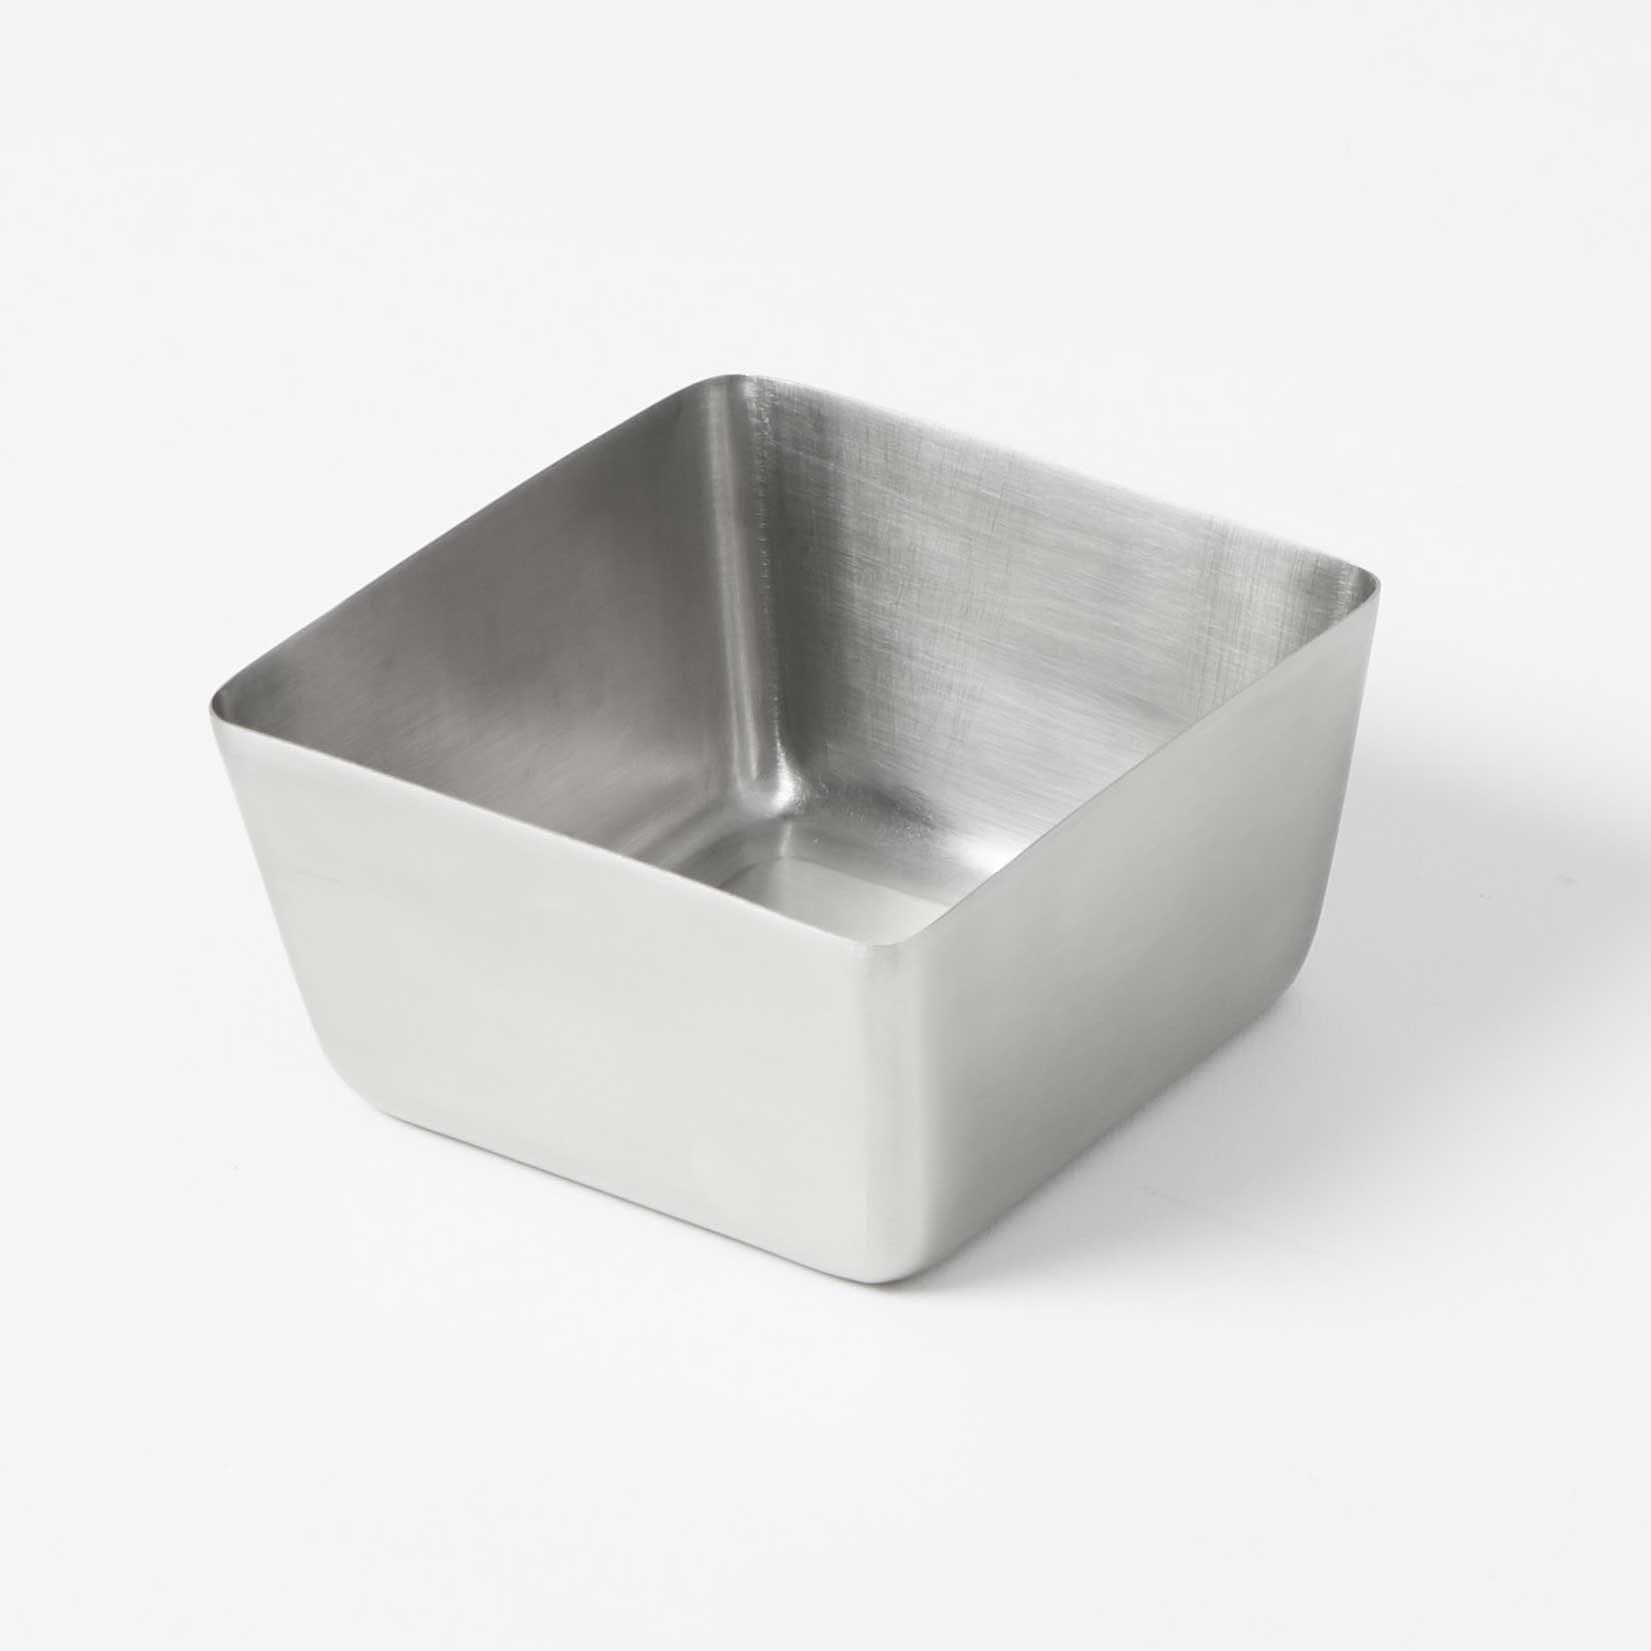 American Metalcraft SSQ53 bowl, metal,  0 - 31 oz